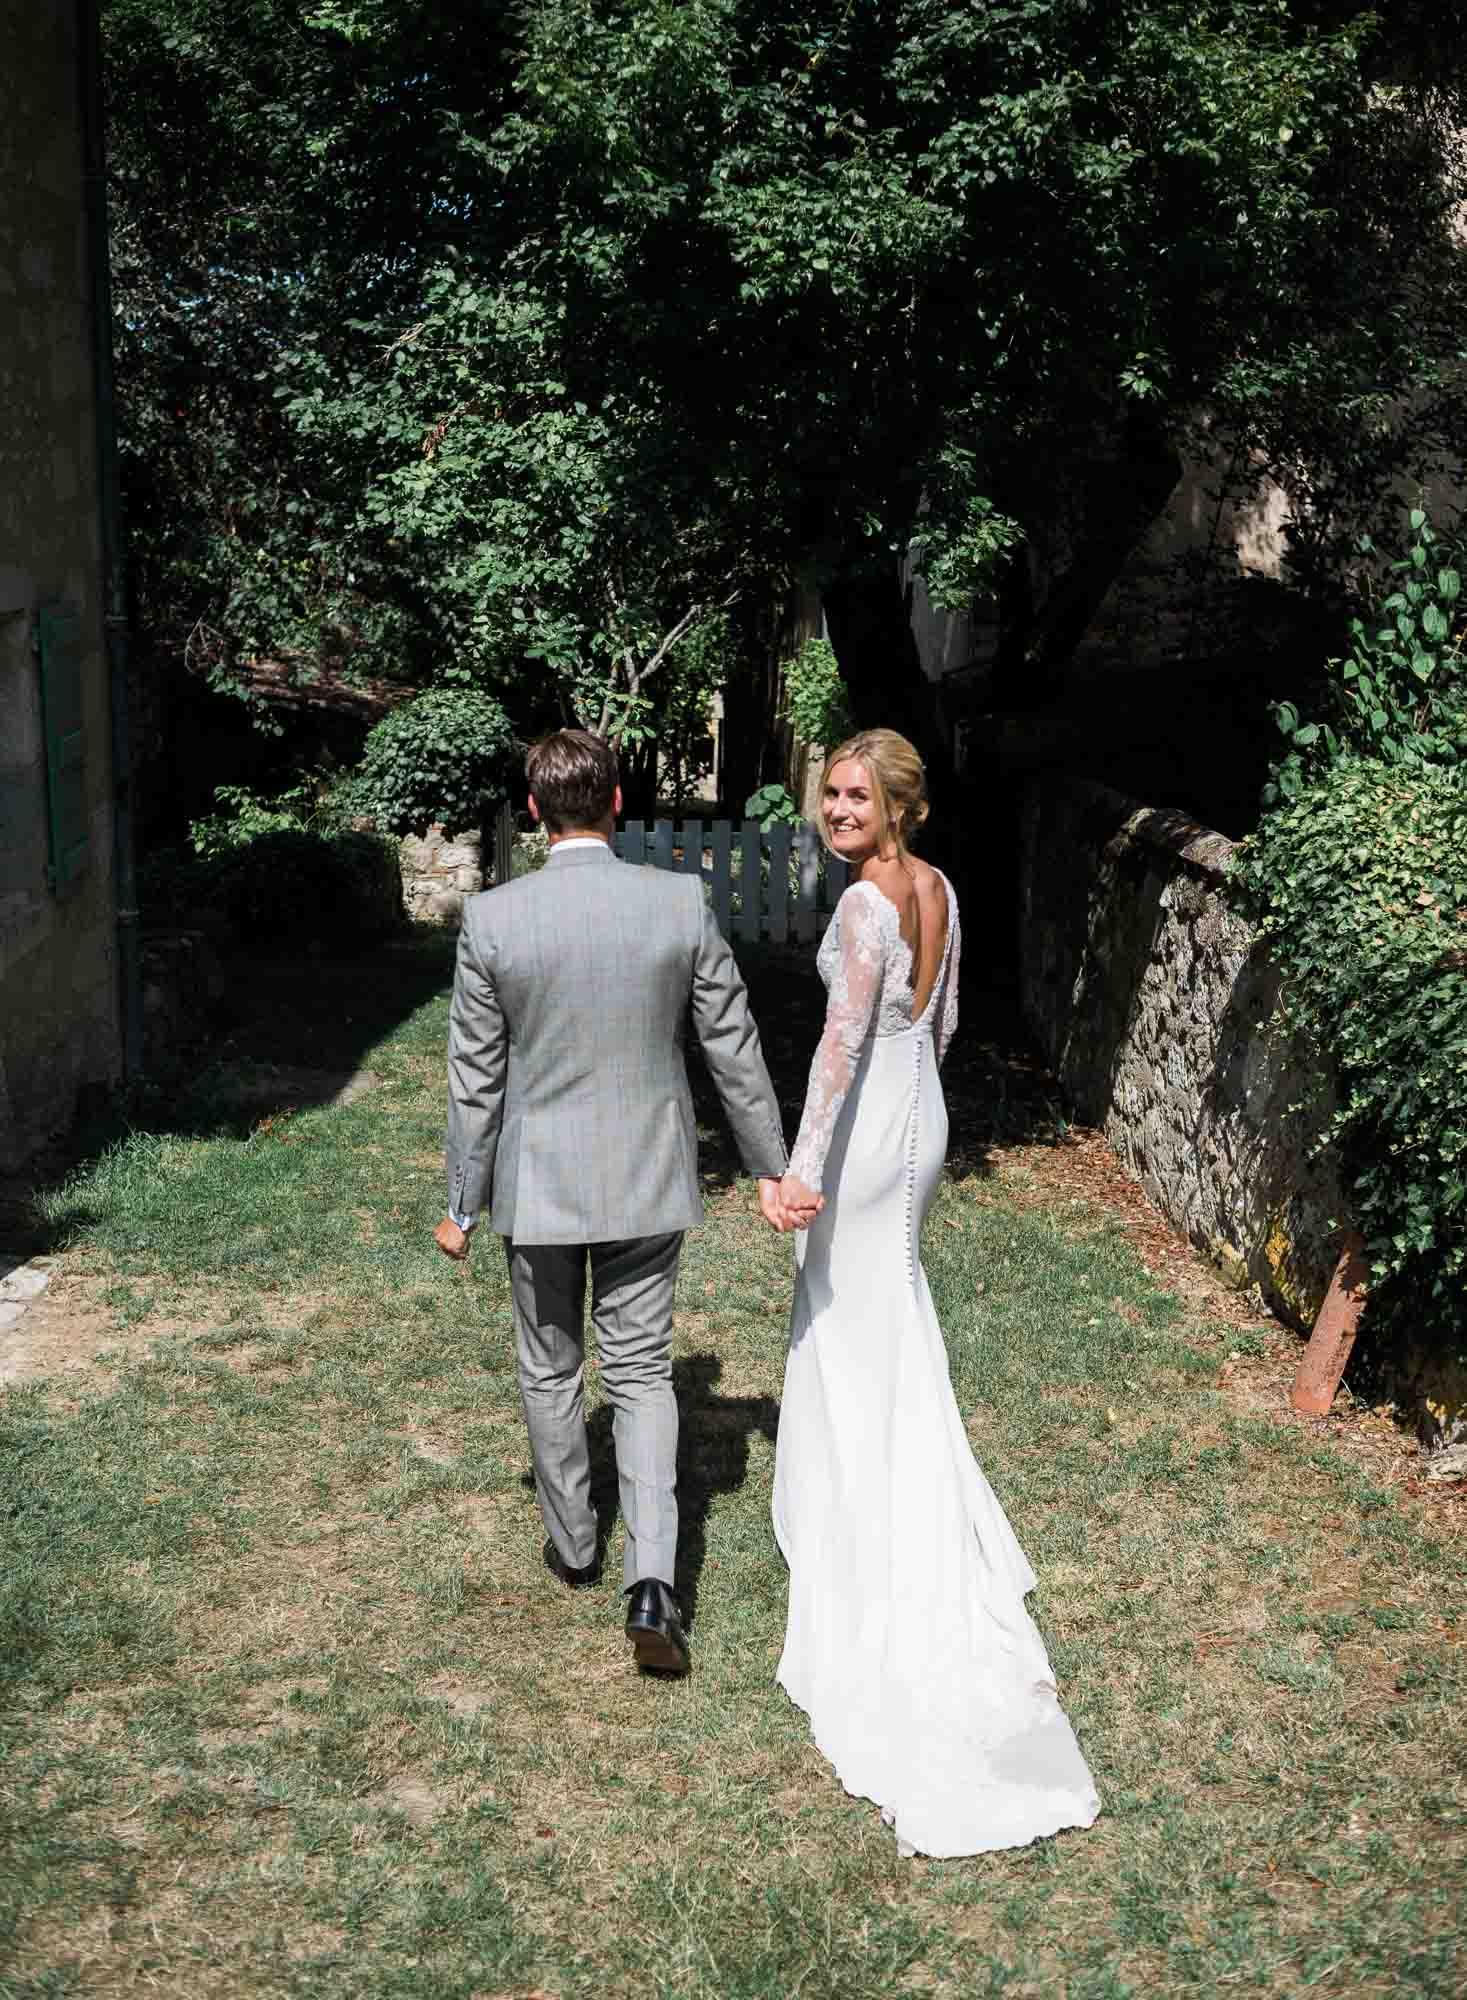 gascony_french_wedding-43.jpg